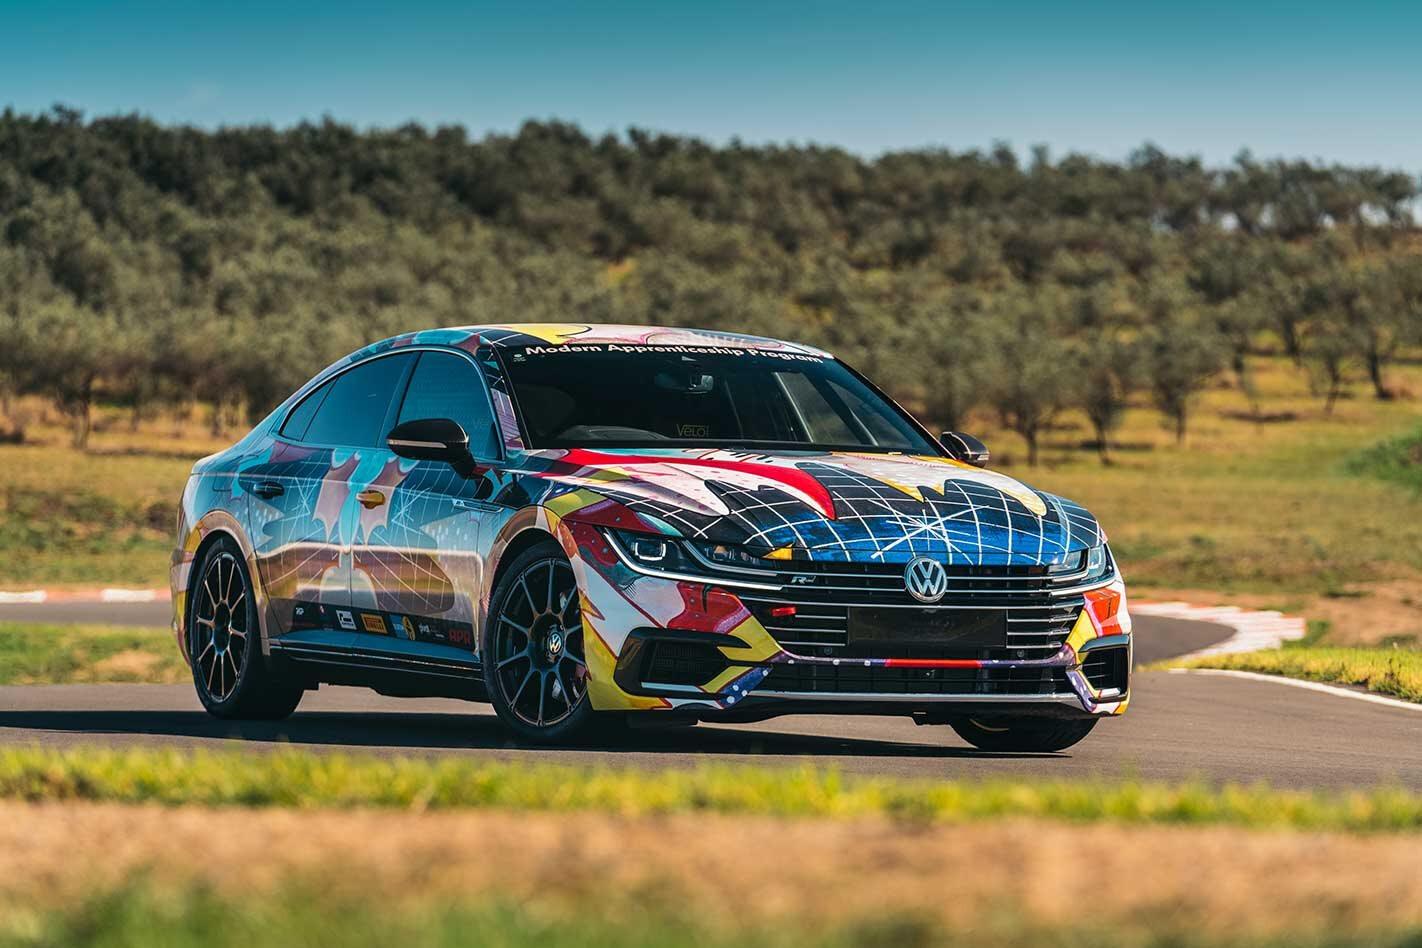 Volkswagen Arteon Time Attack Car Revealed Jpg